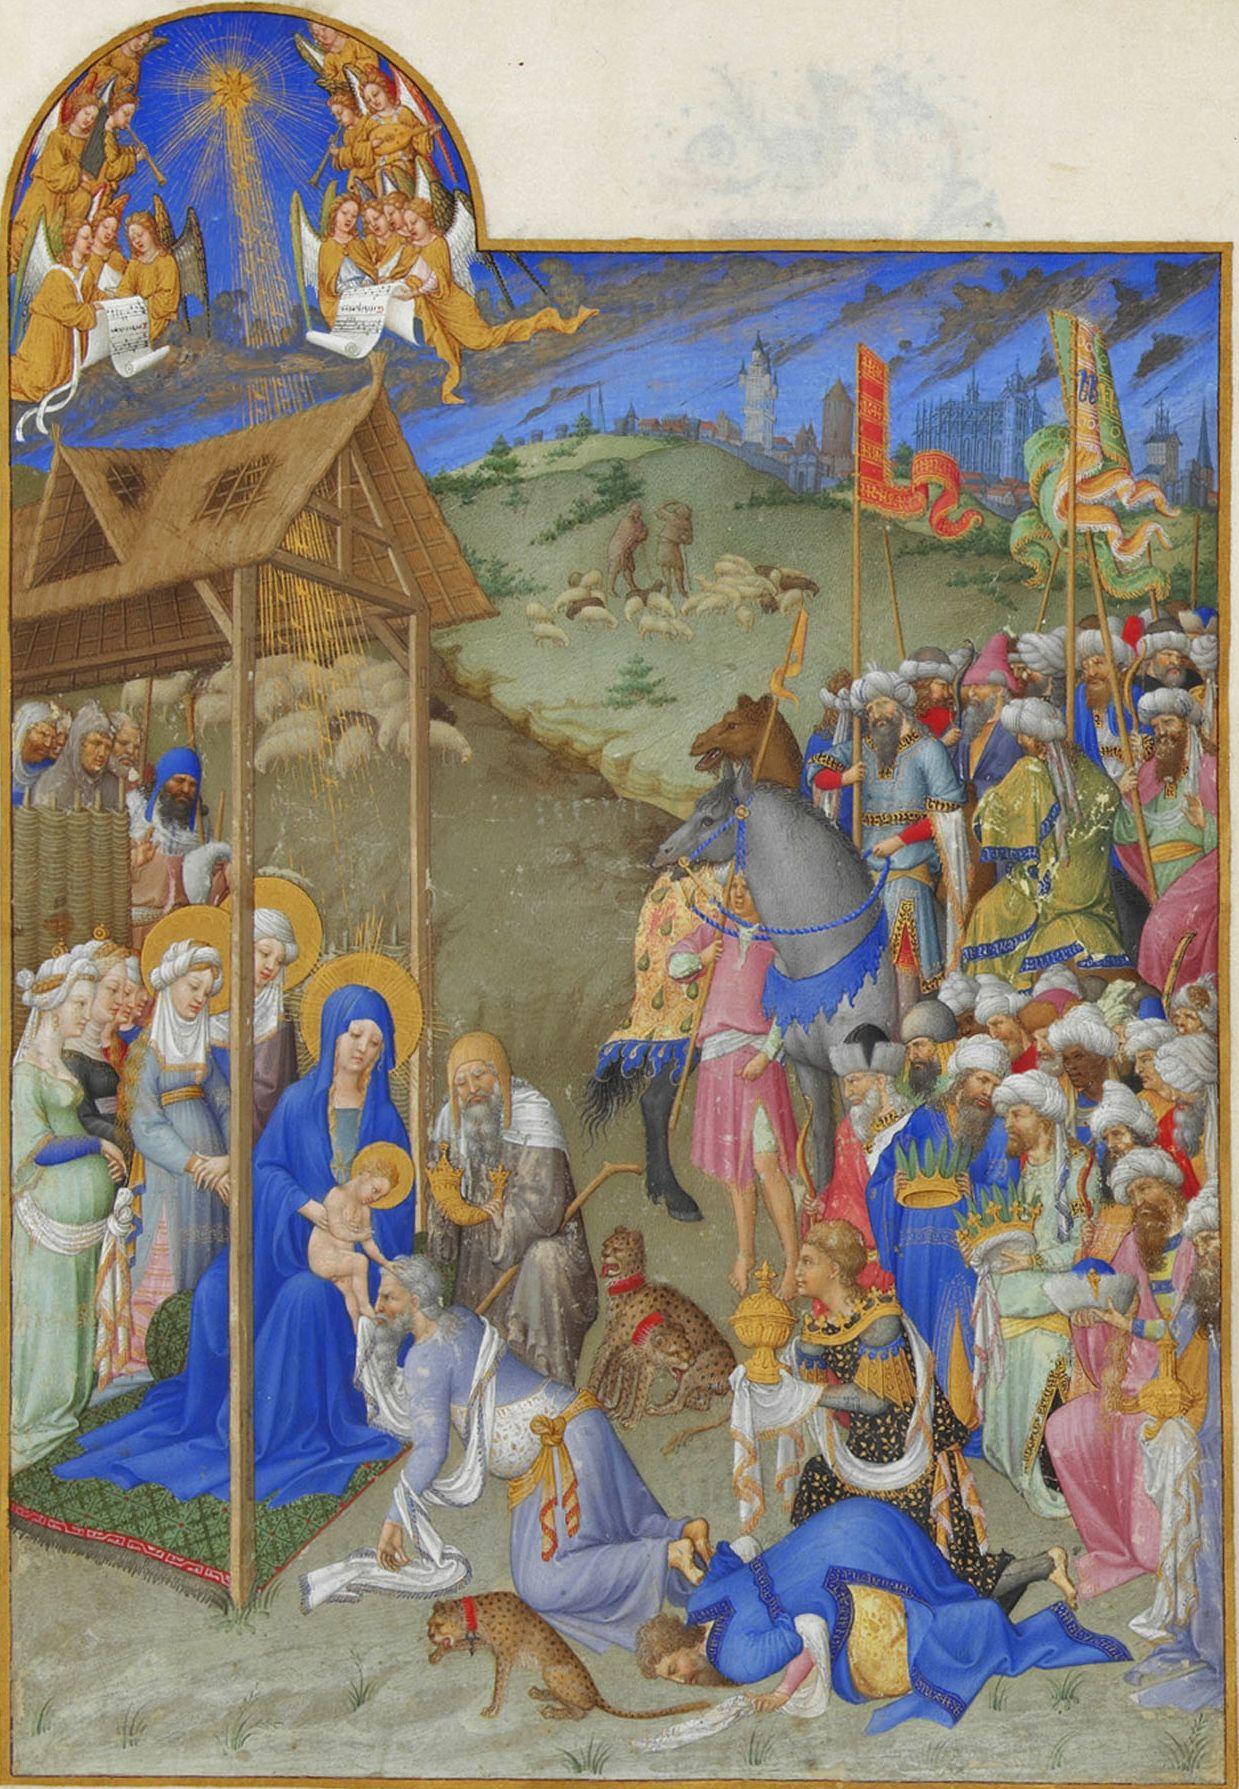 Folio_52r_-_The_Adoration_of_the_Magi.jpg